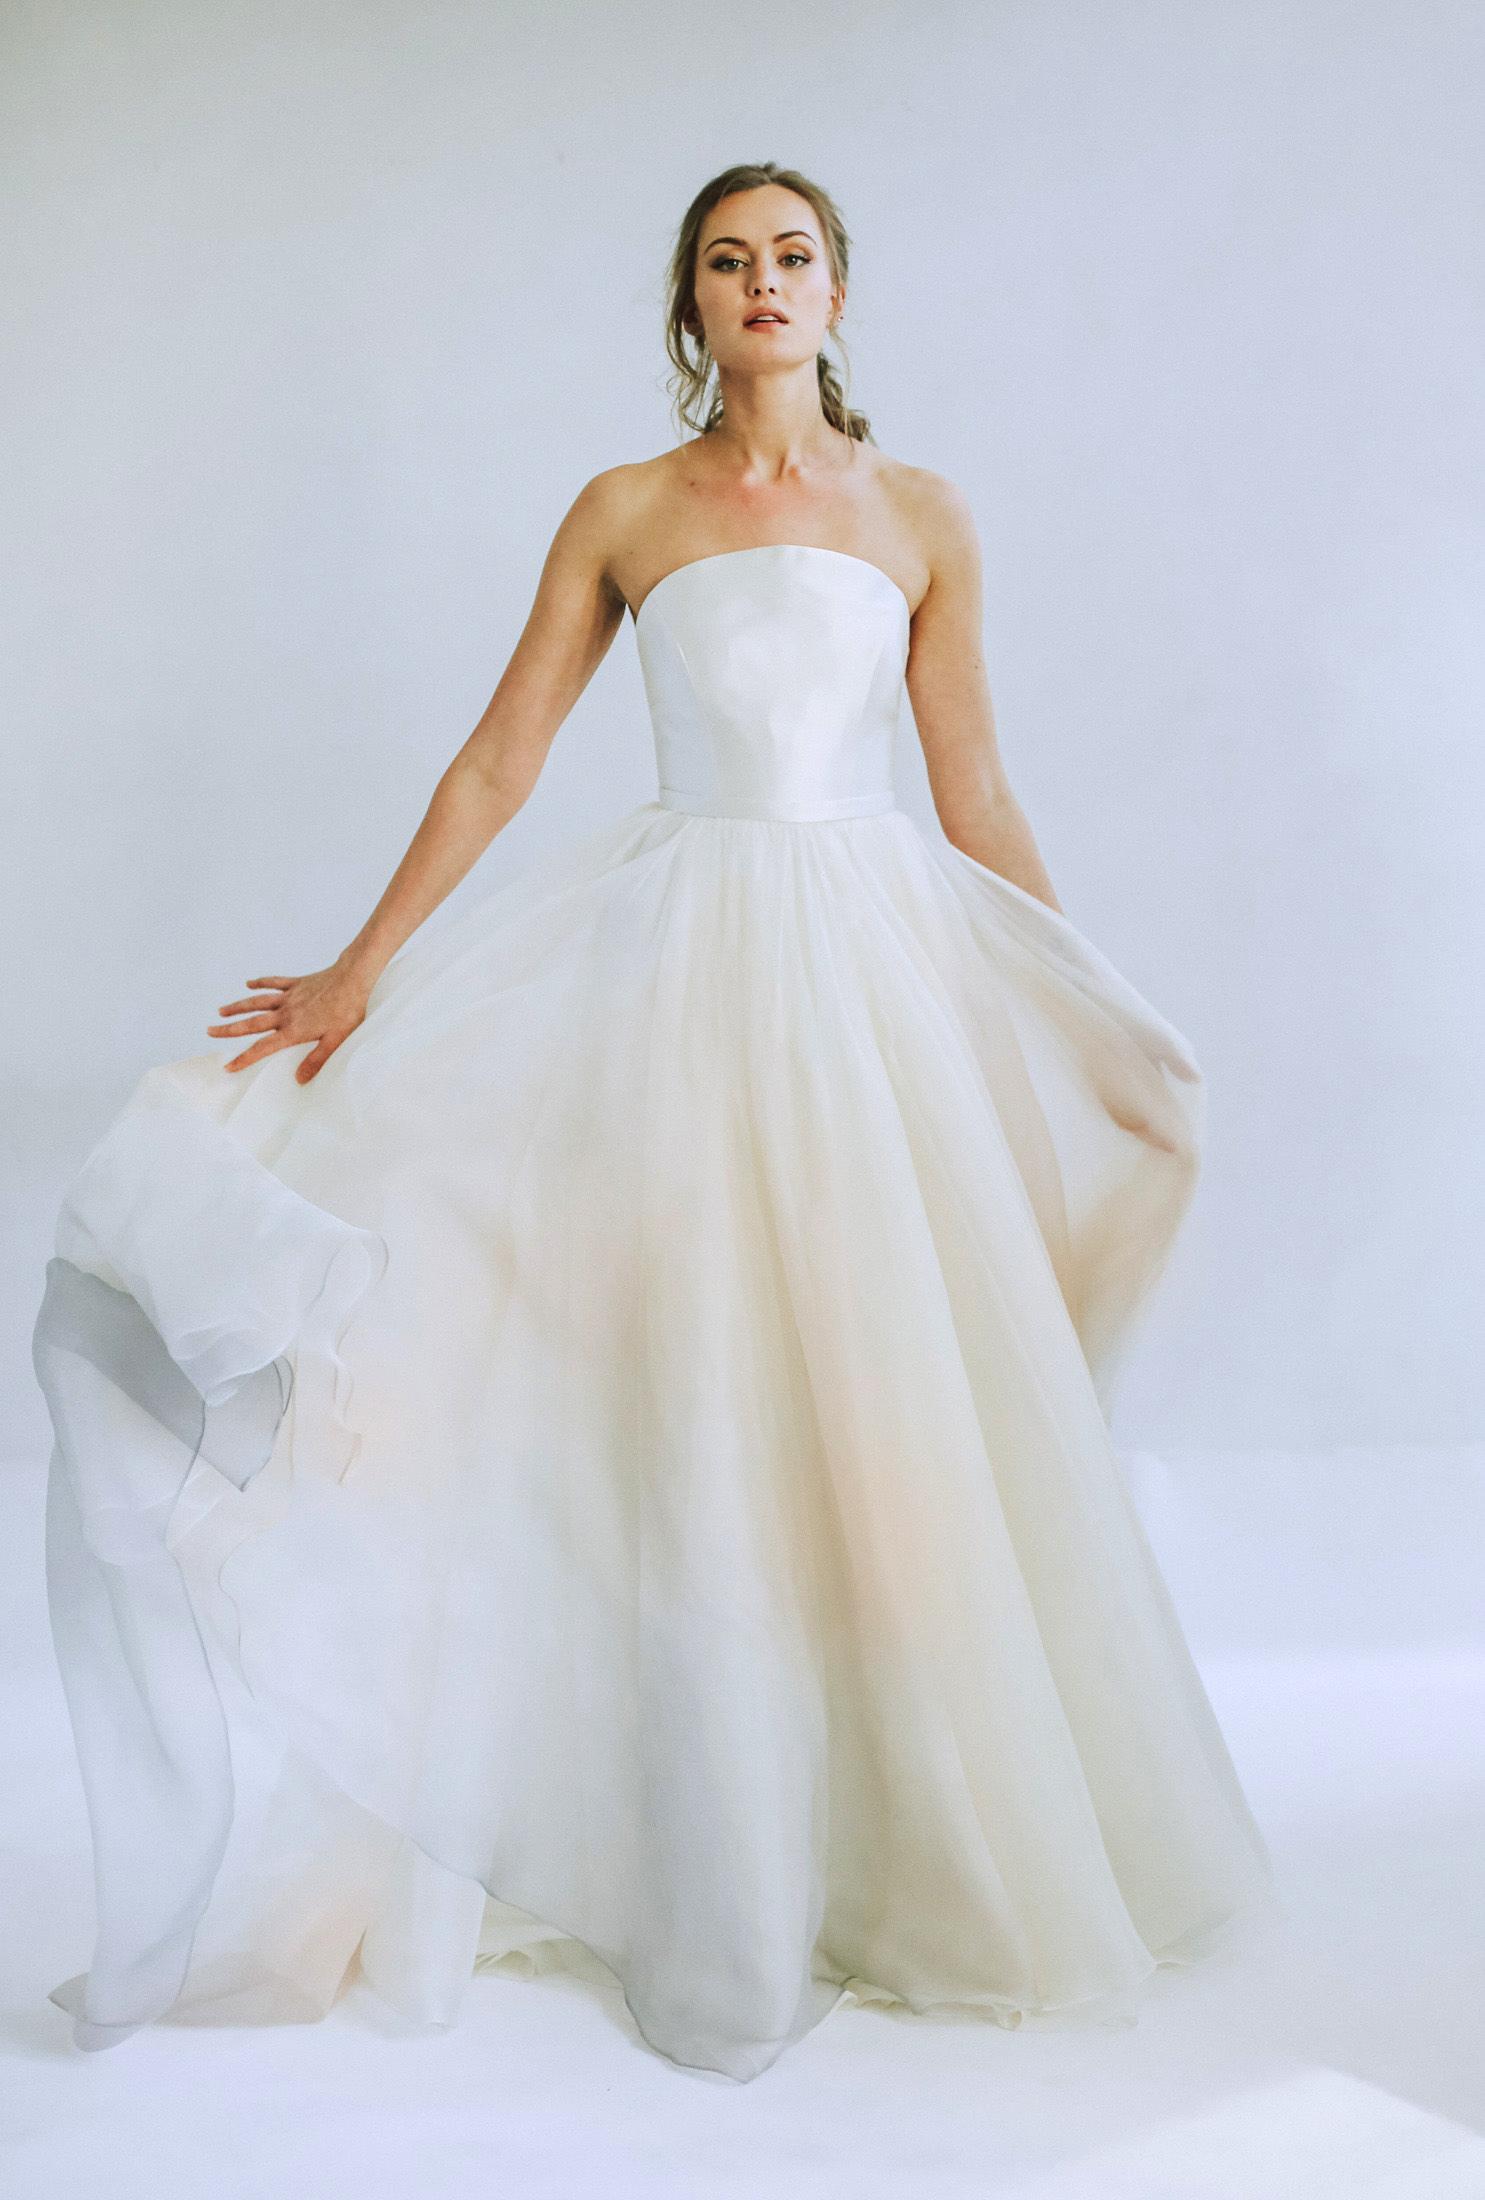 leanna marshall strapless sheer ball gown wedding dress spring 2020